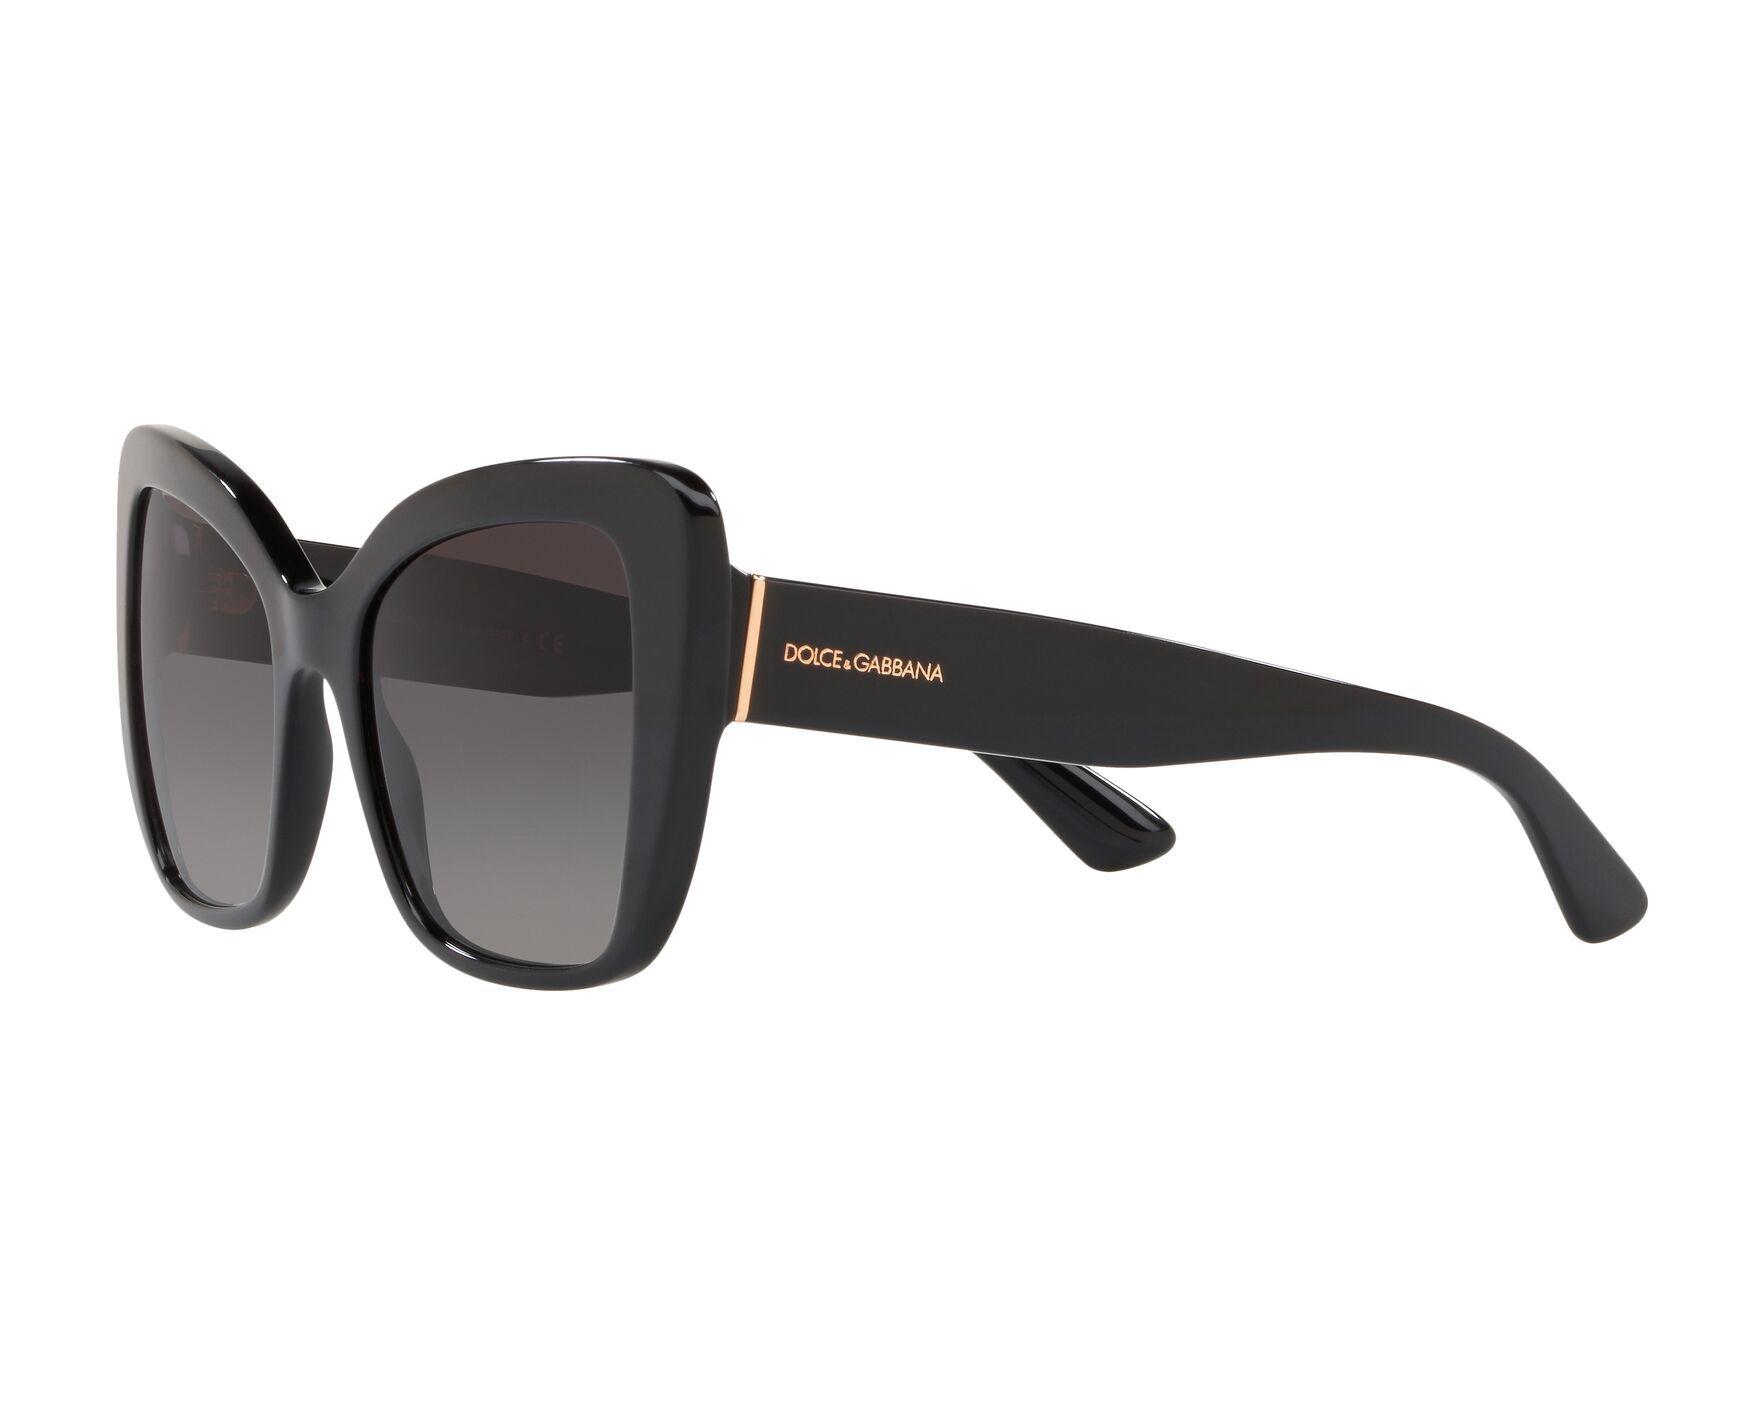 Dolce & Gabbana DG 4348 5018G